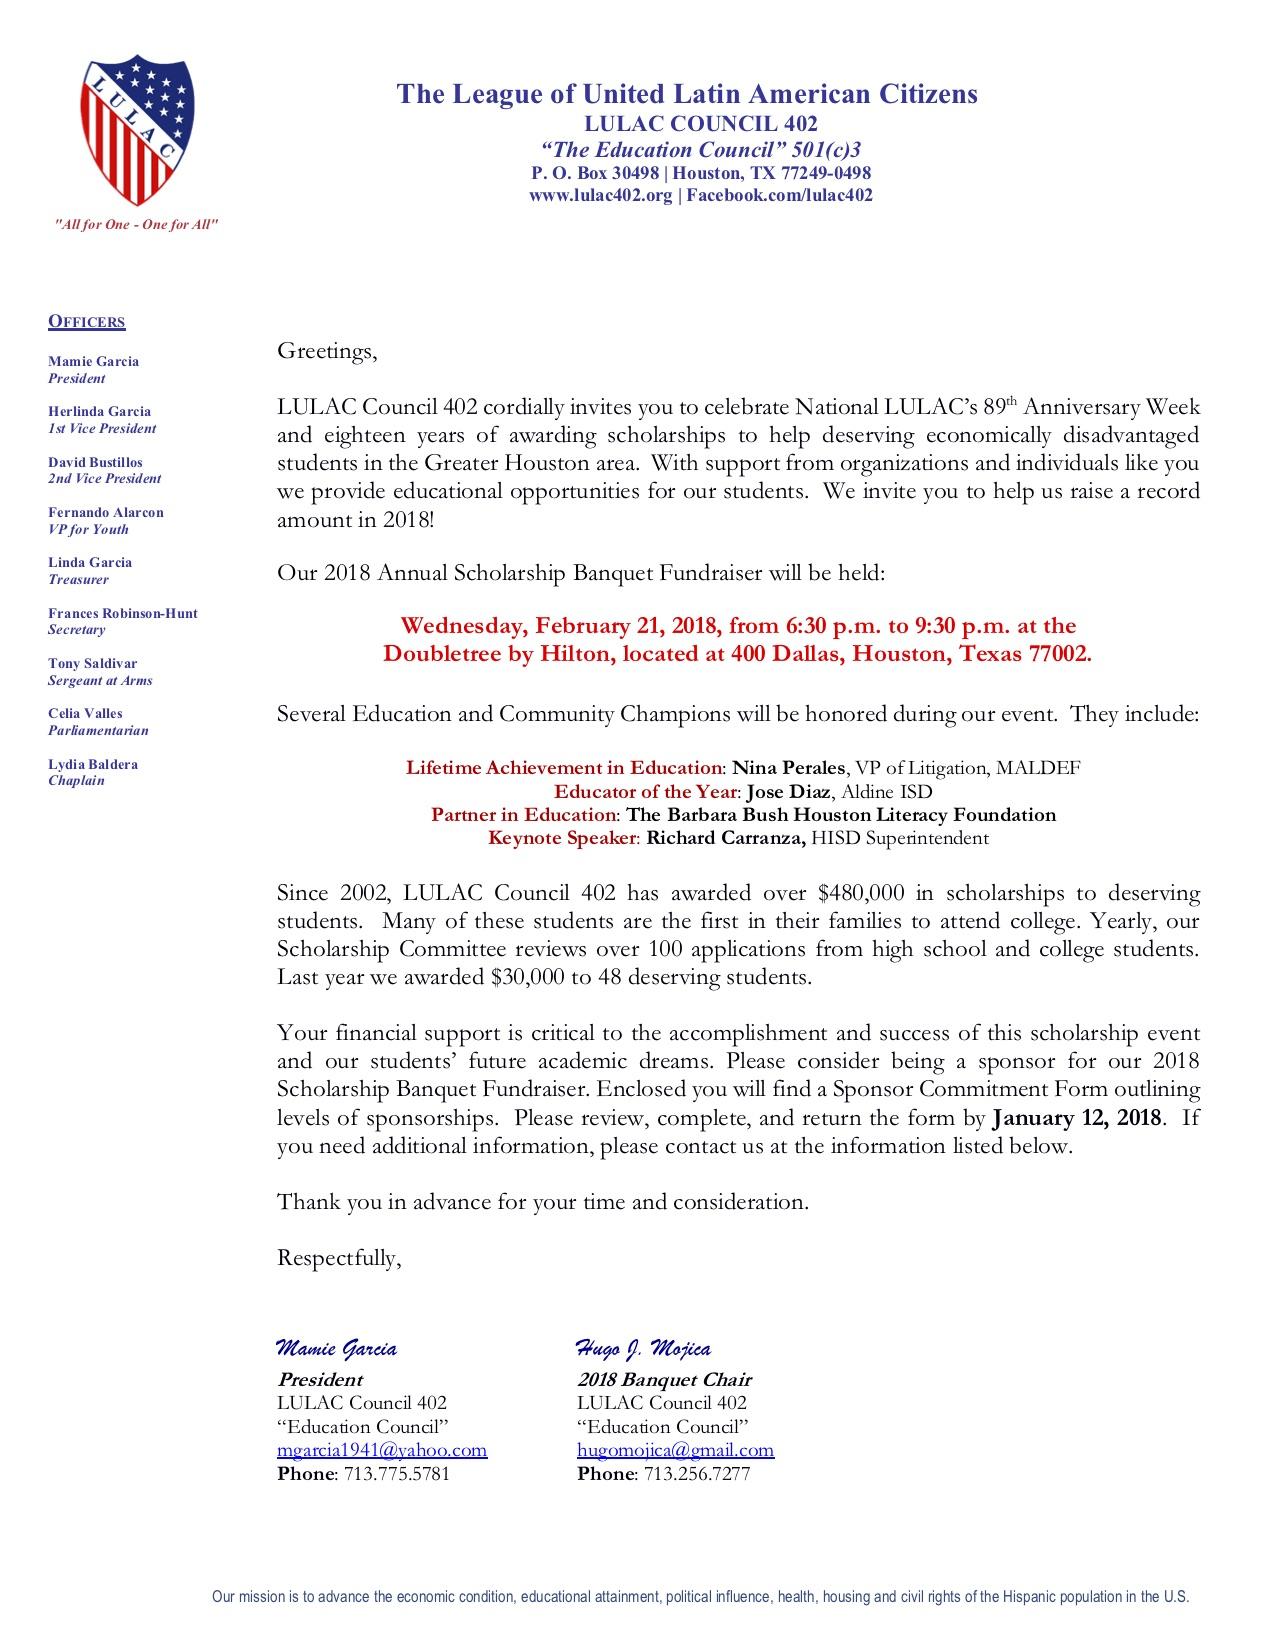 2018 LULAC Council 402 Banquet